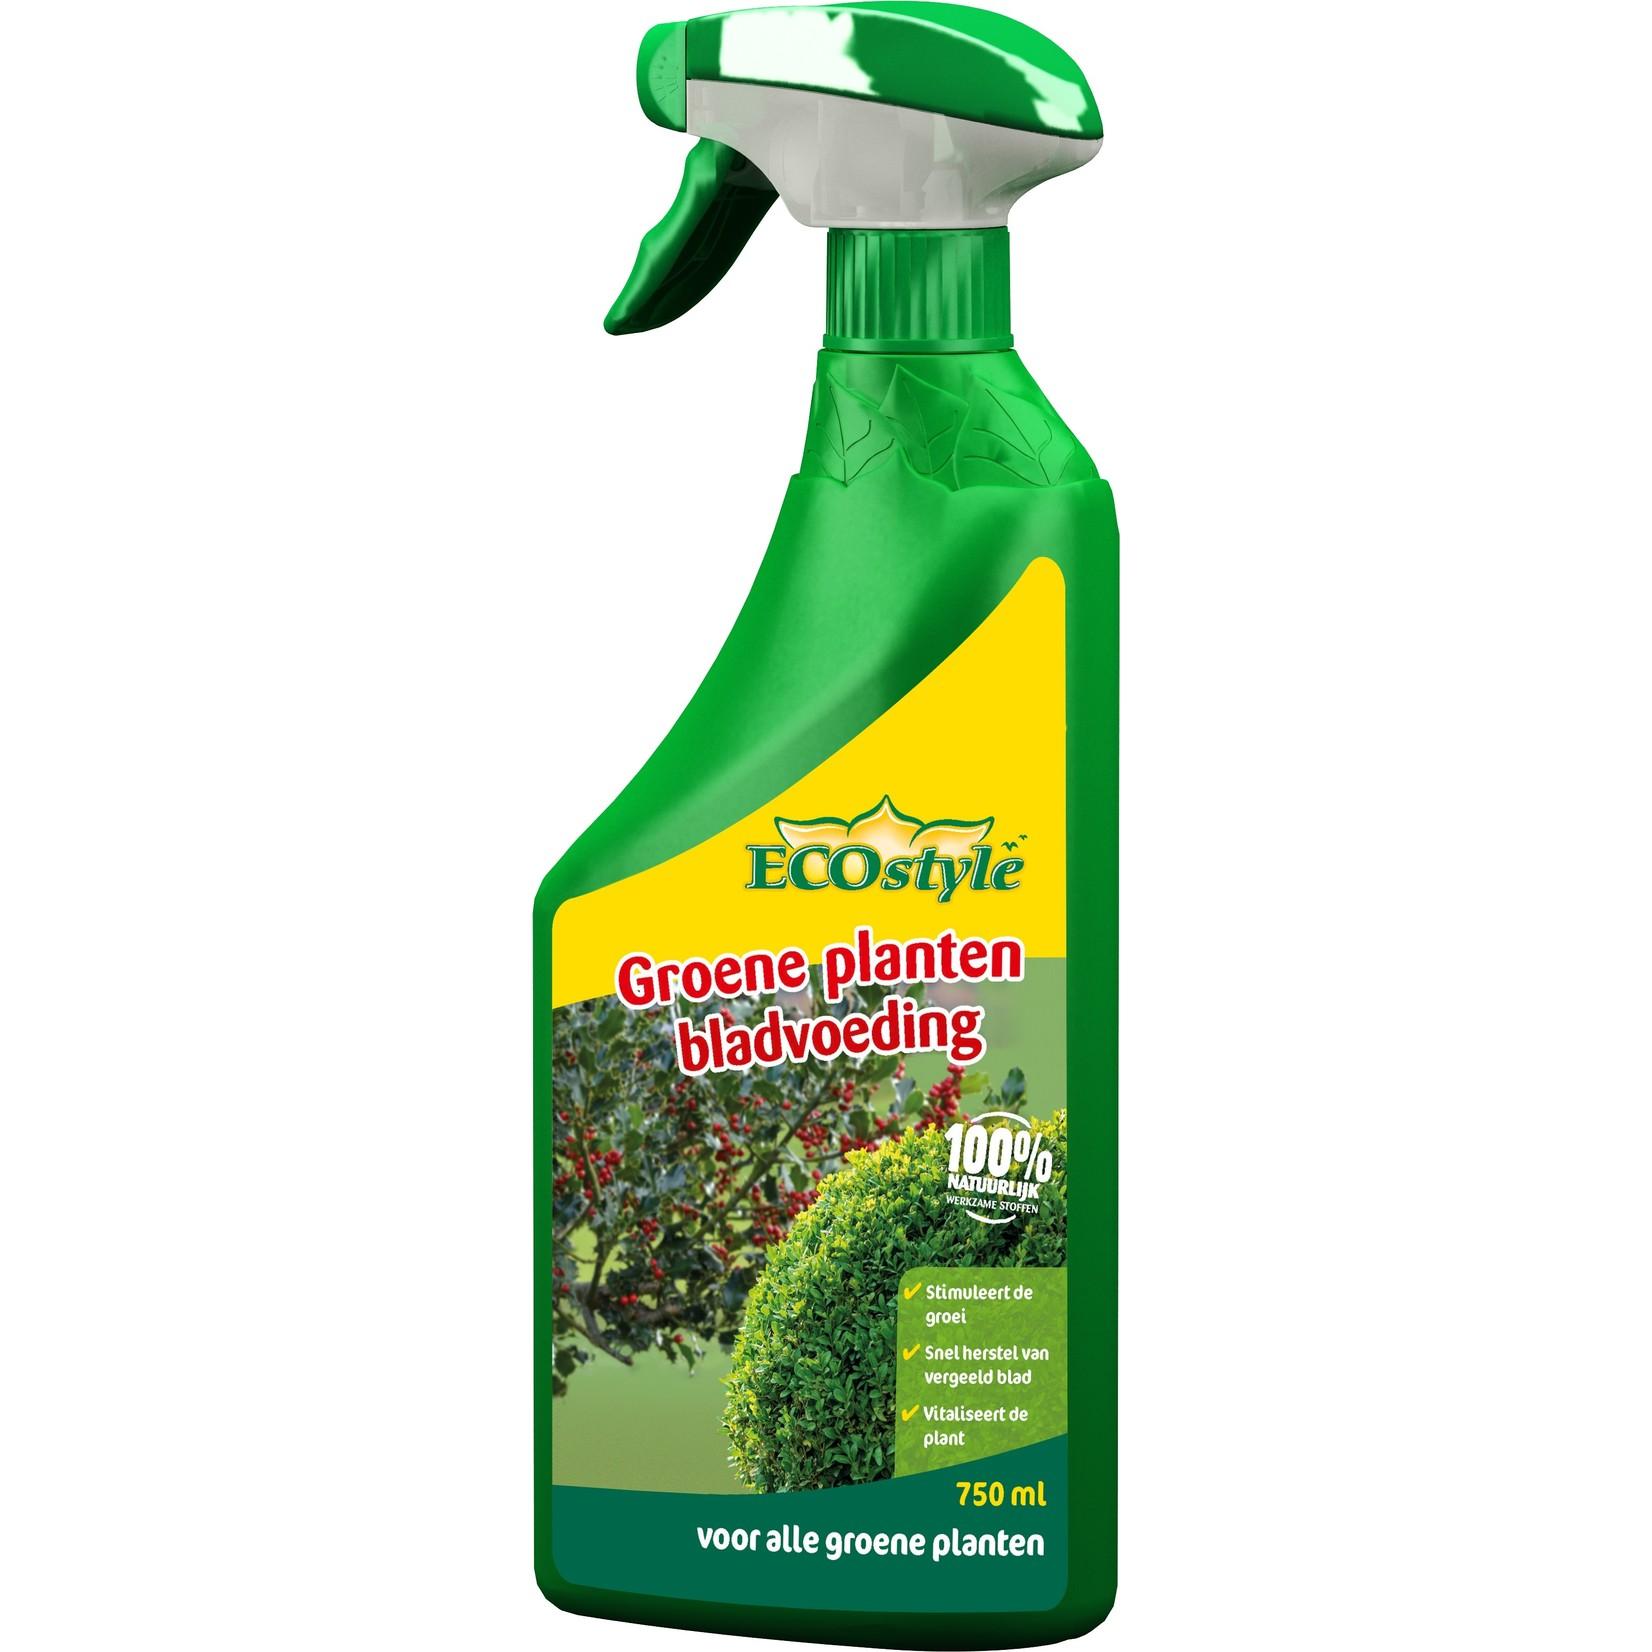 Ecostyle Buxus & Groene planten Bladvoeding 750 ml (spray)